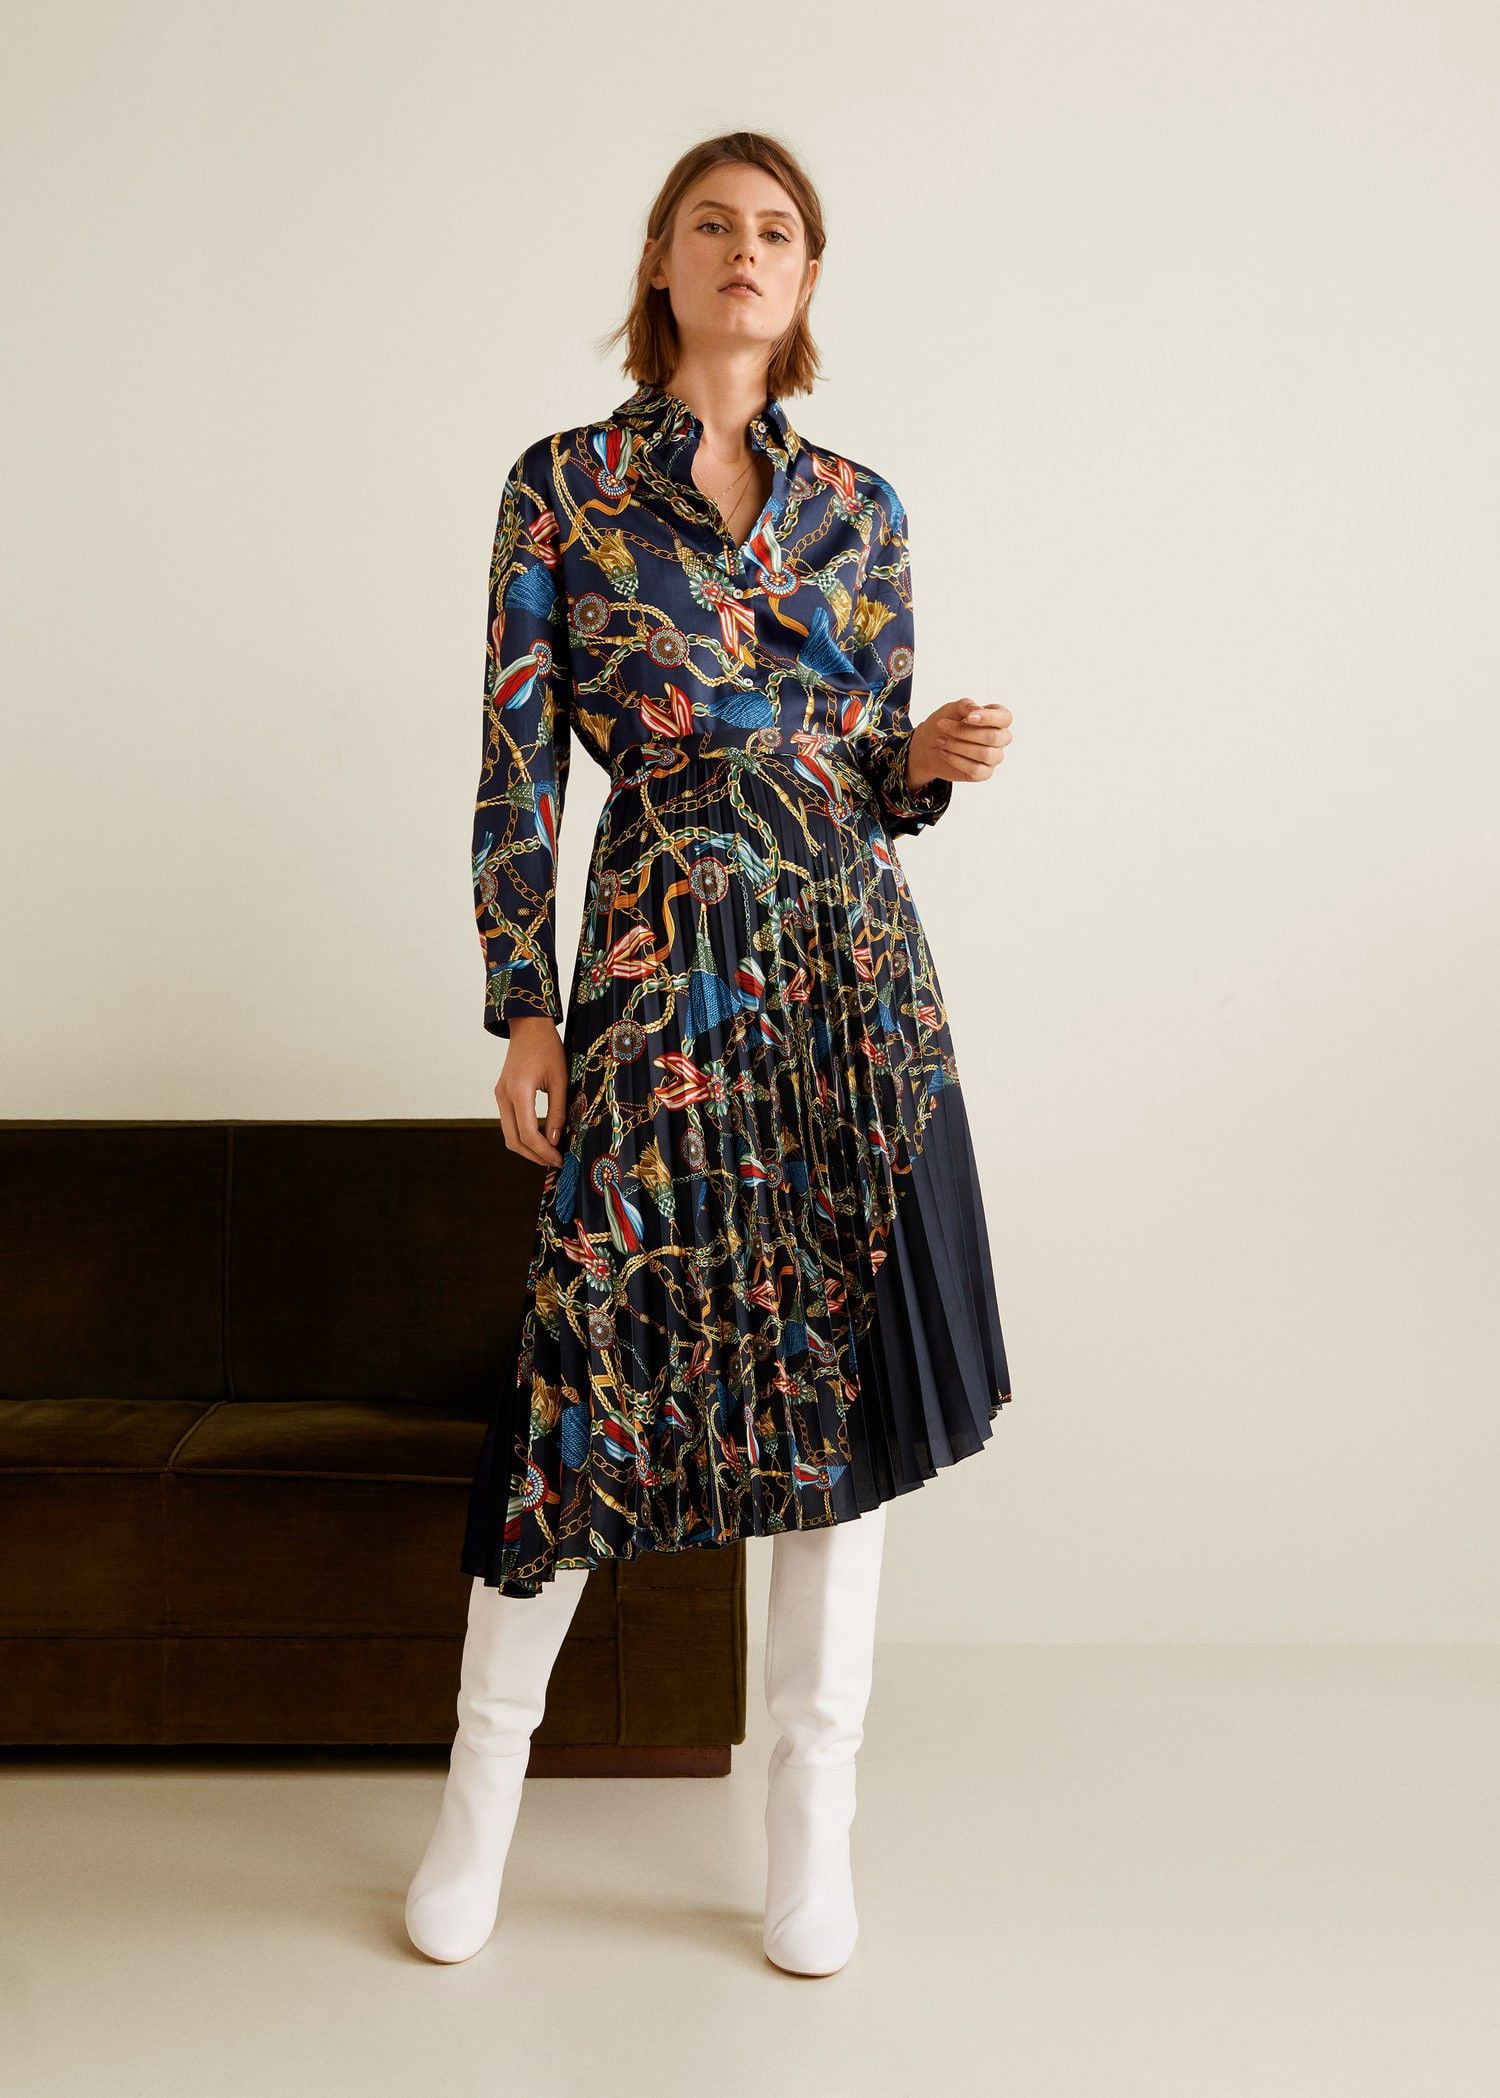 2b2e804e6 Mango Scarf Print Pleated Skirt - XXS in 2019 | Products | Pleated ...